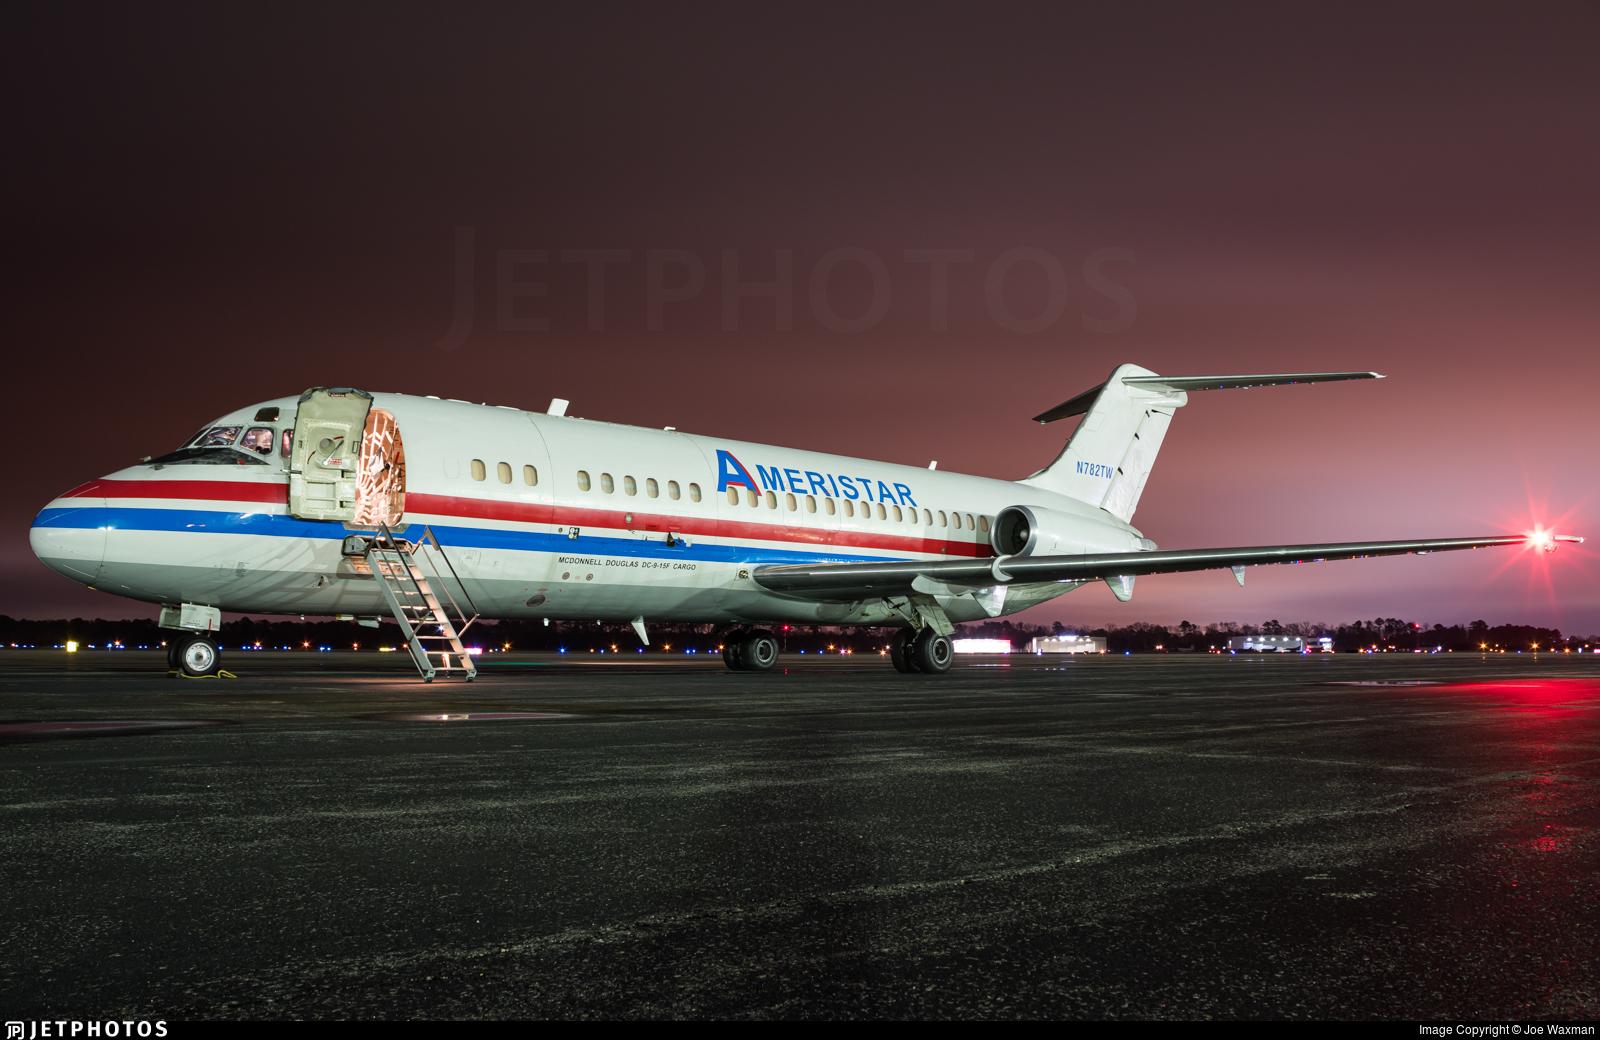 old Ameristar DC-9